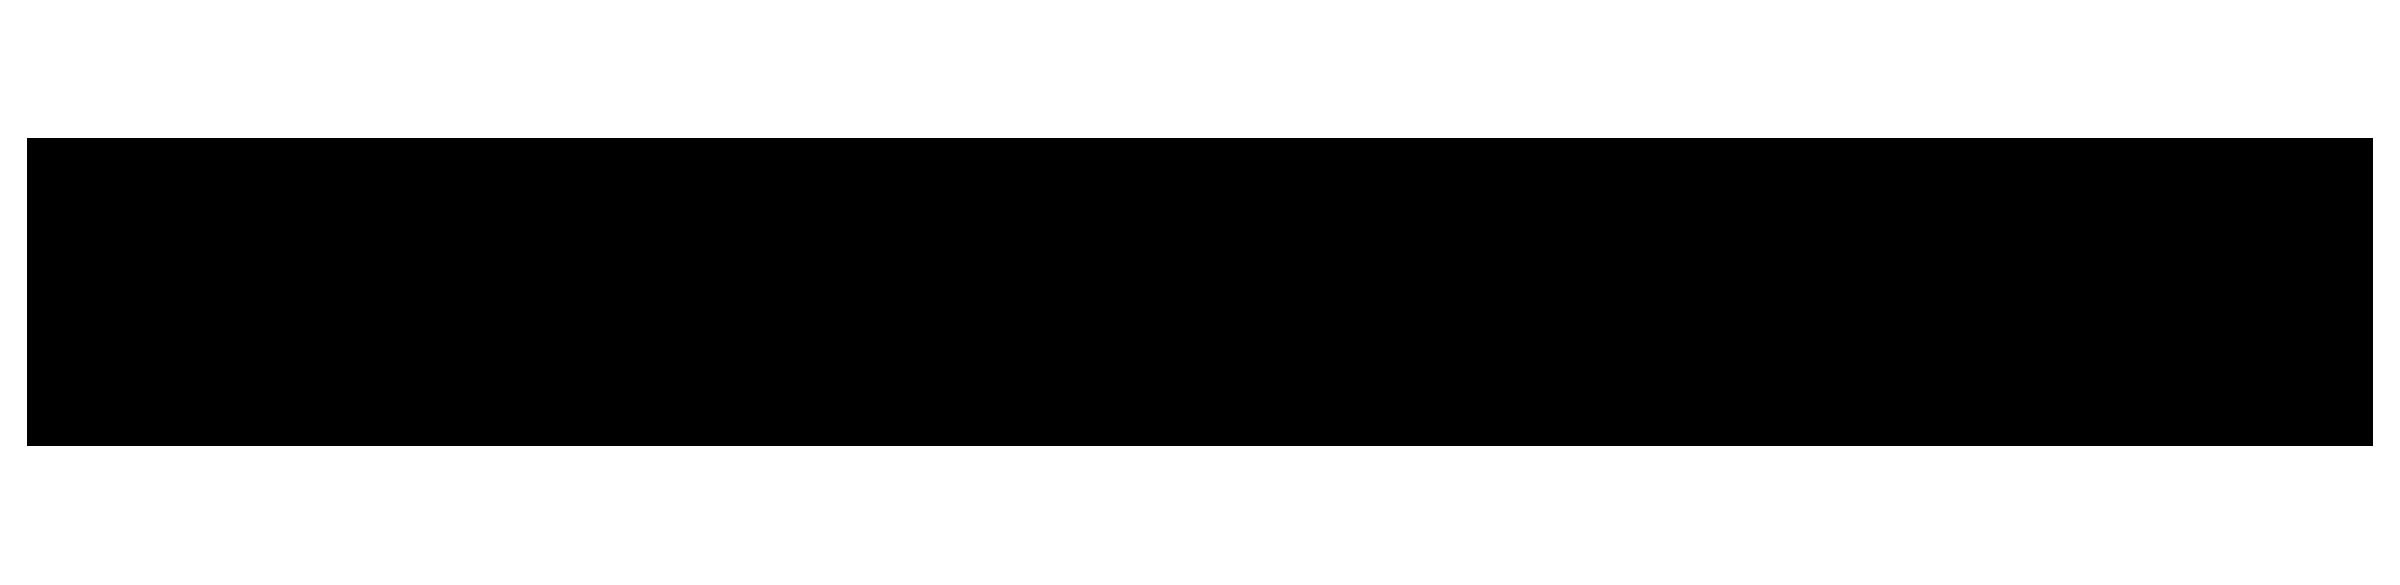 Aluflex Monolith